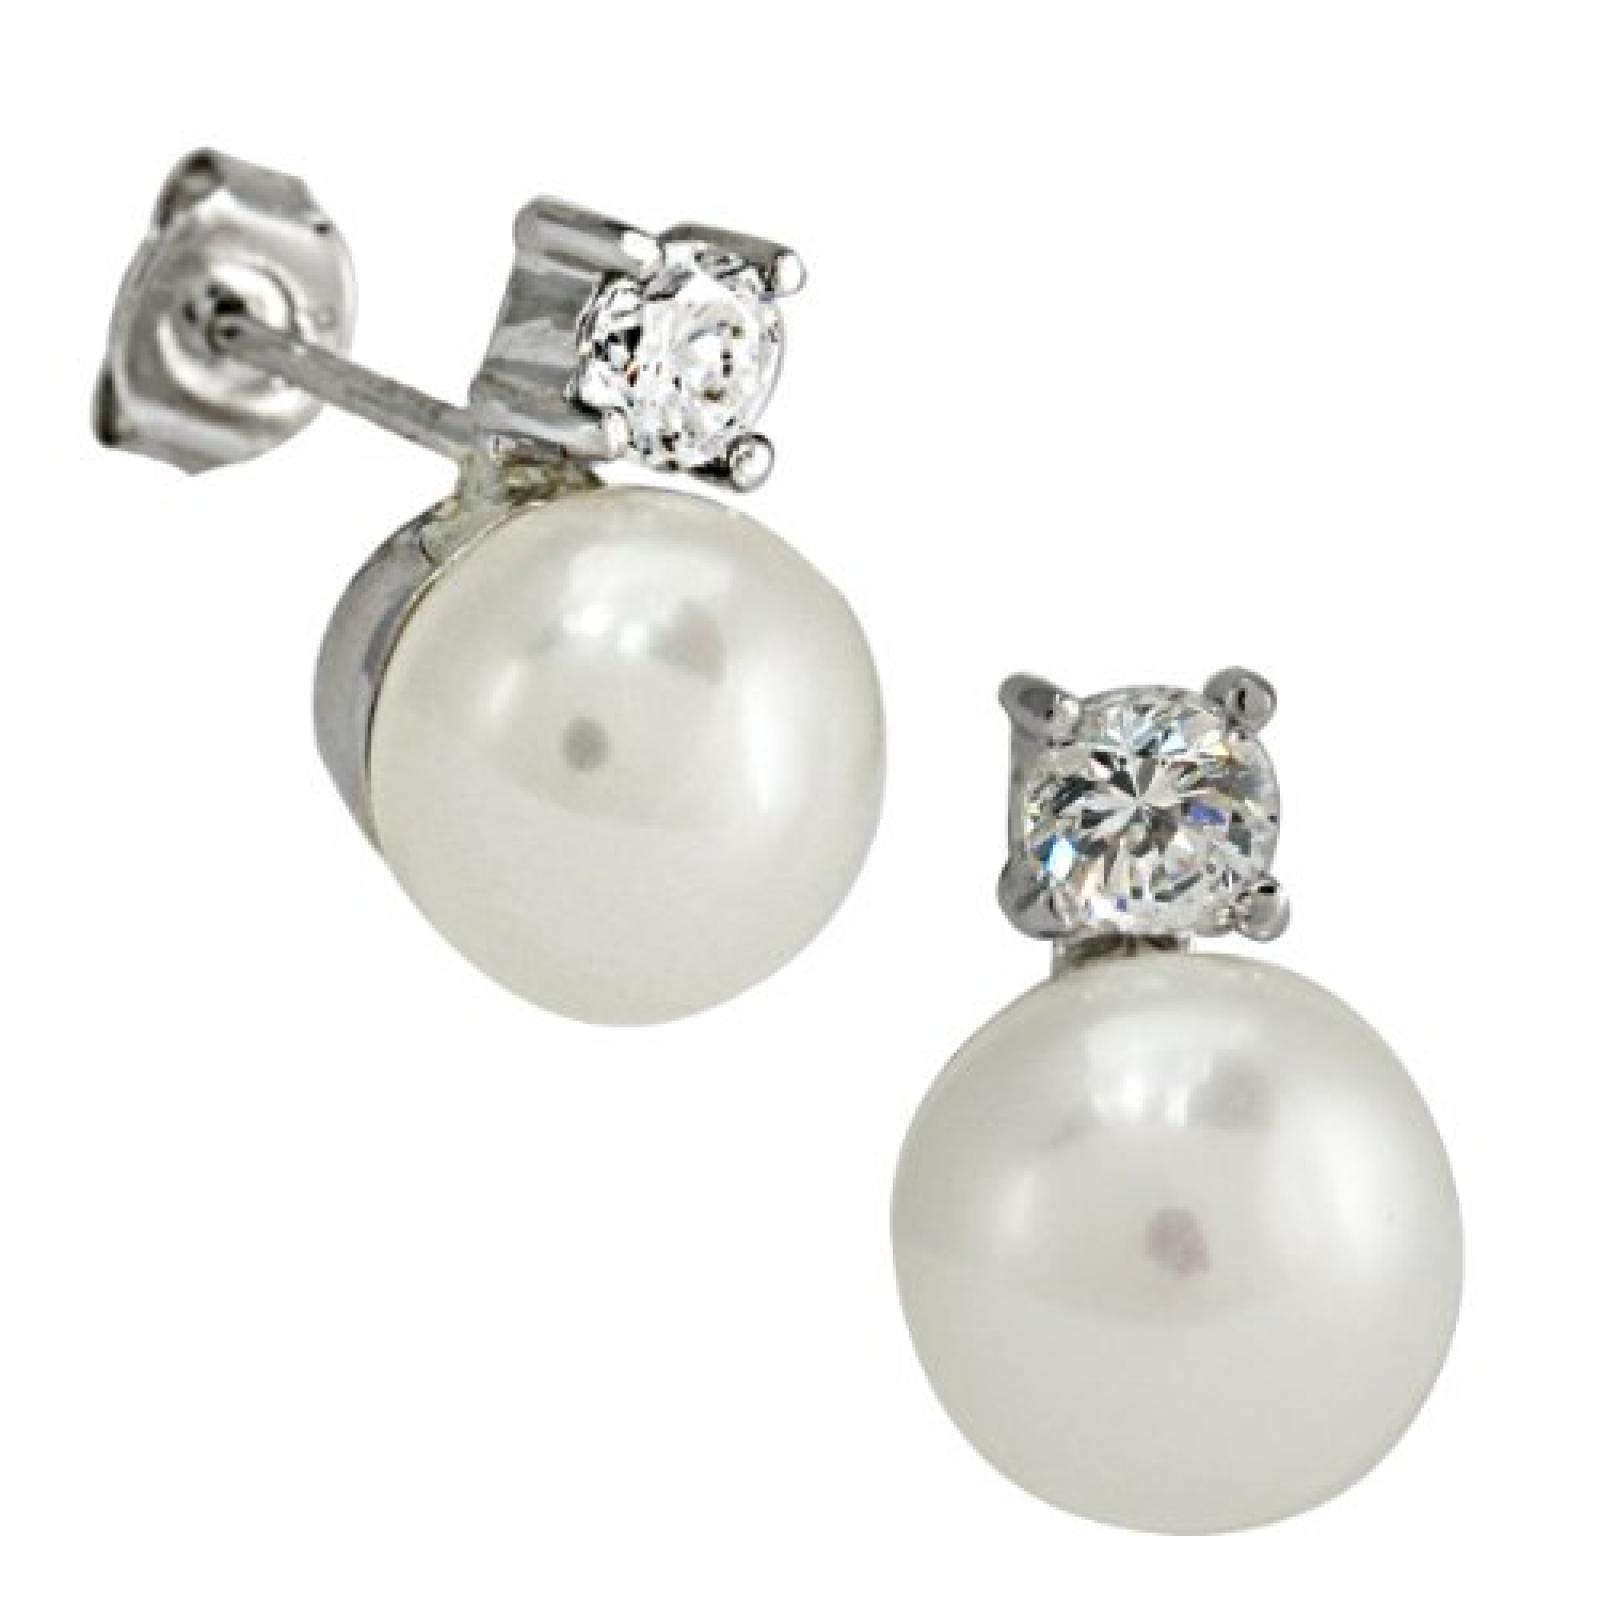 Bella Donna Damen Perlenohrstecker 925/000 Silber 2 Süßwasser-Zuchtperlen weiß 8,0-8,5 mm 2 Zirkonia 635494